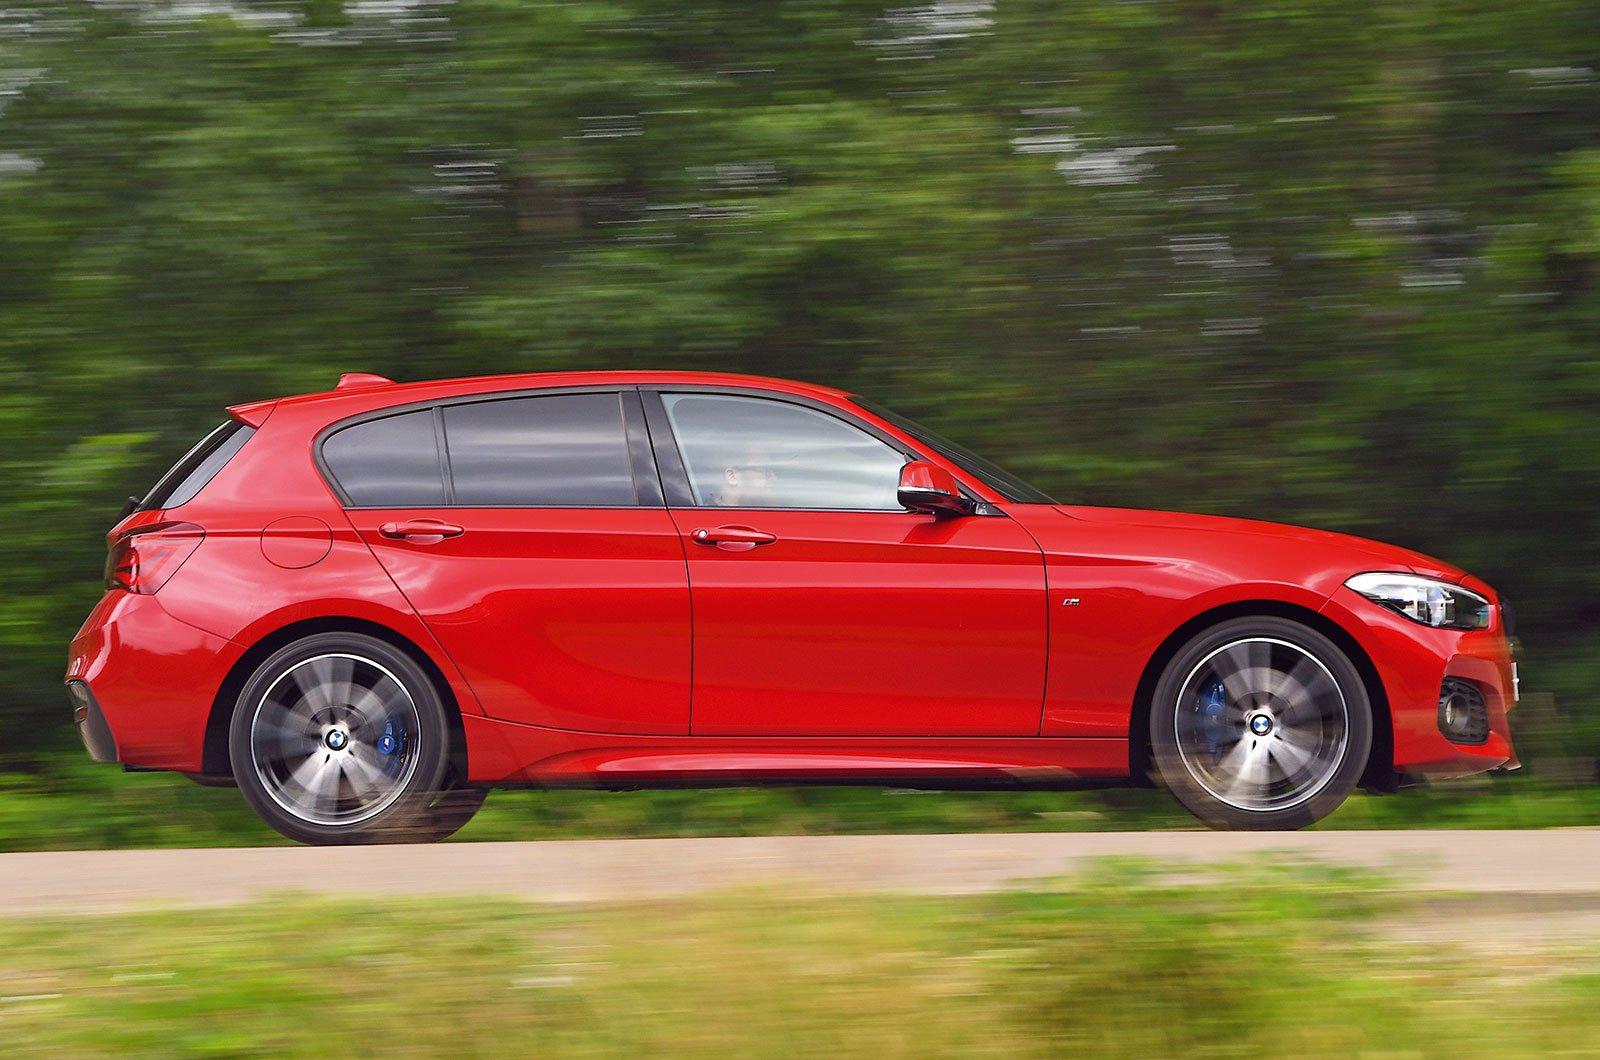 BMW 1 Series side